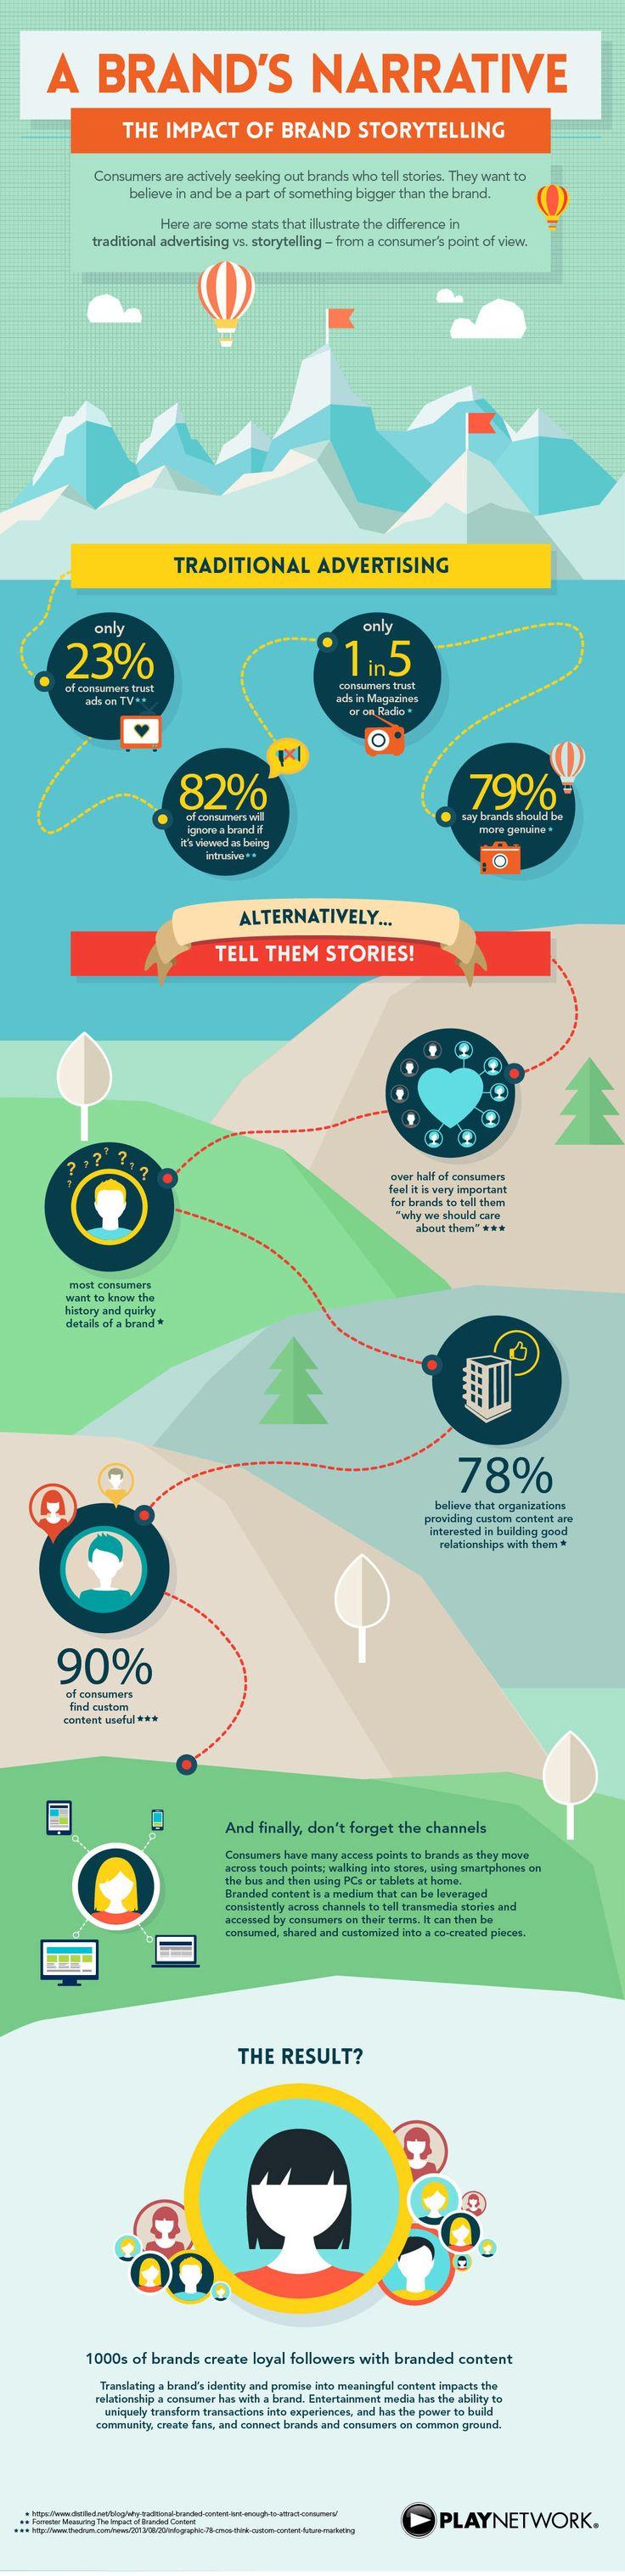 The Impact of Brand Storytelling #infographic #infografia